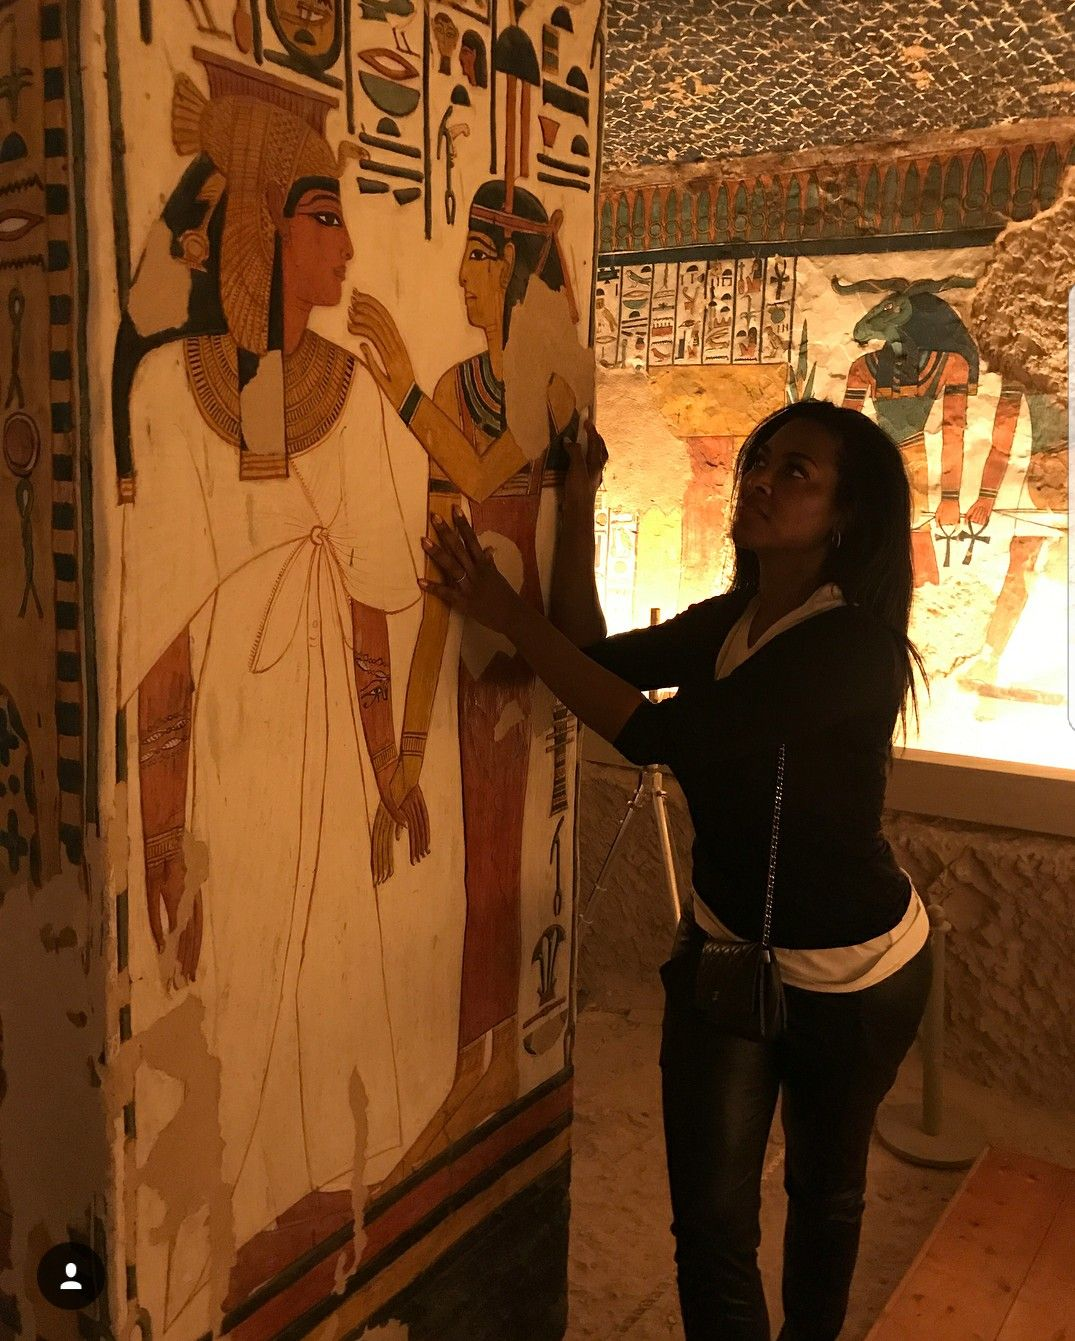 Kenya MooreDaley's personal photo. Egypt, Ancient